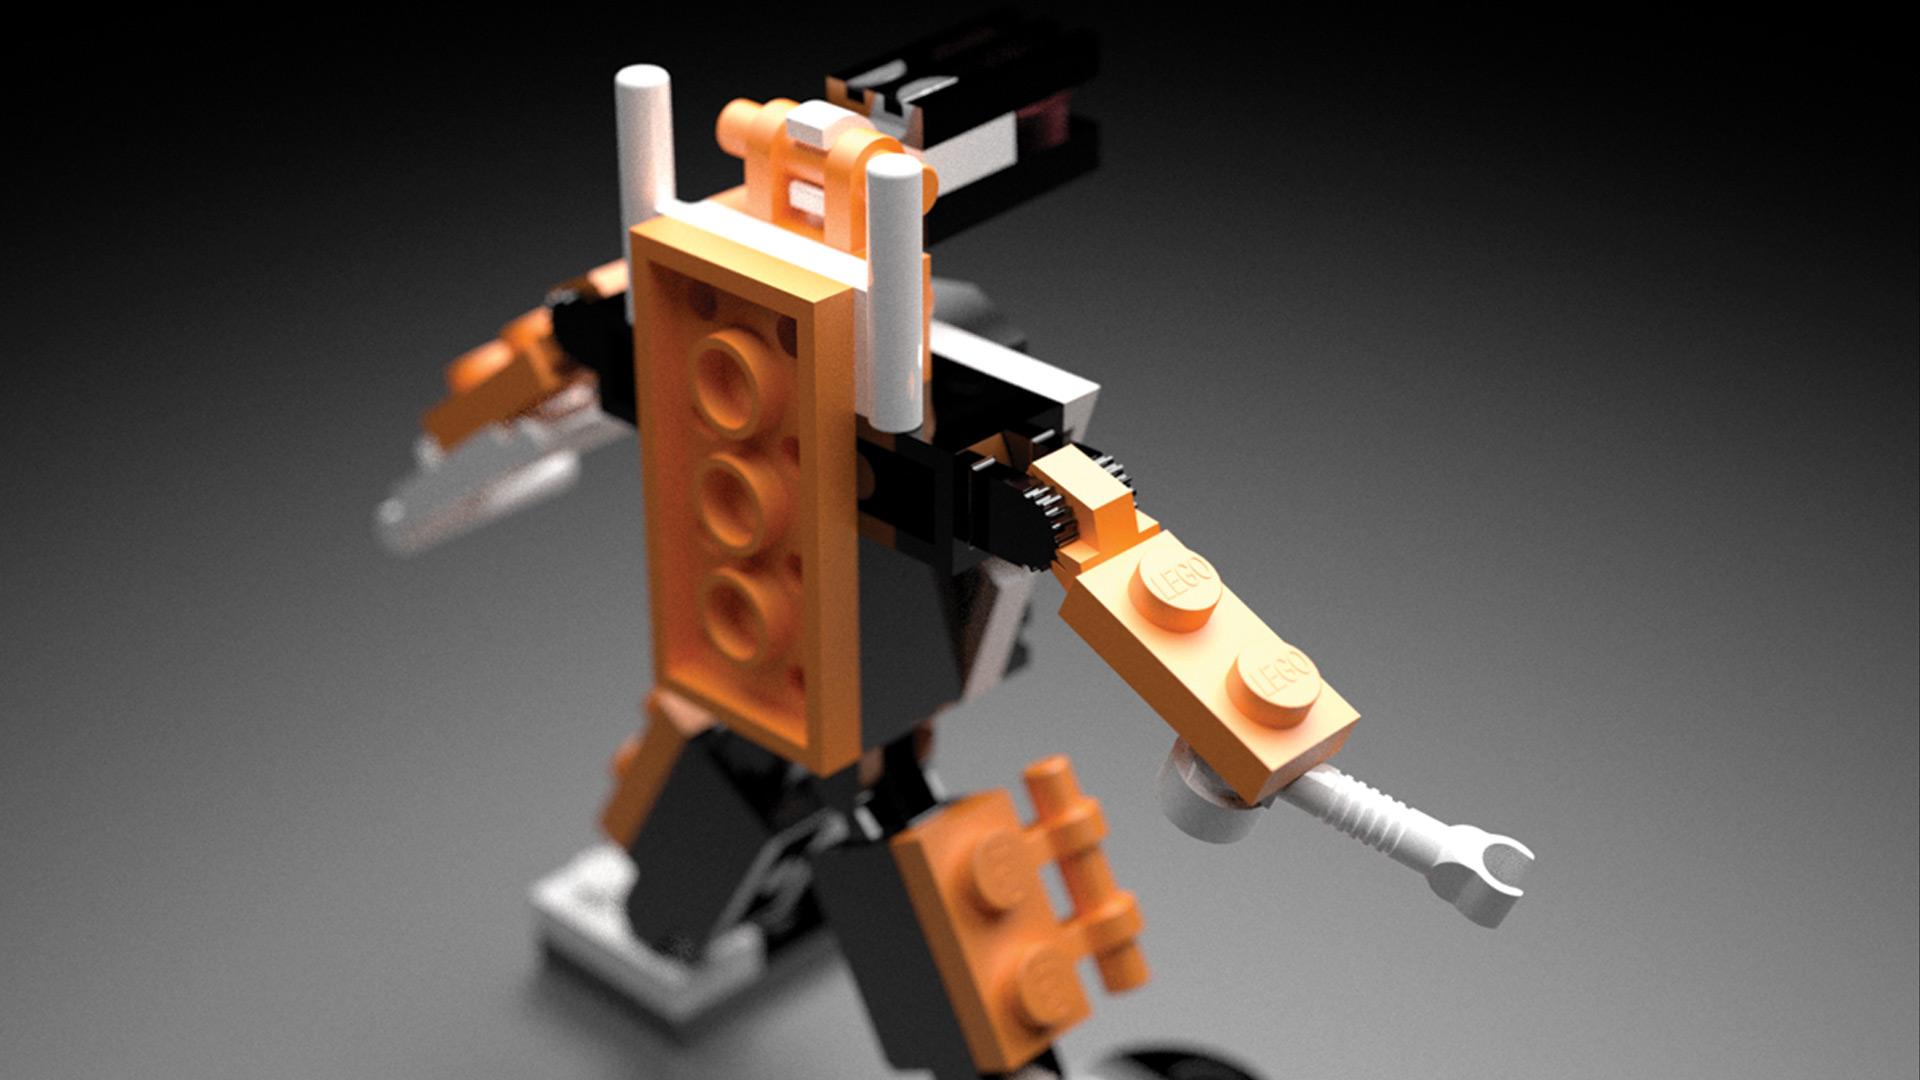 Lego designer set 7910 – Ligori